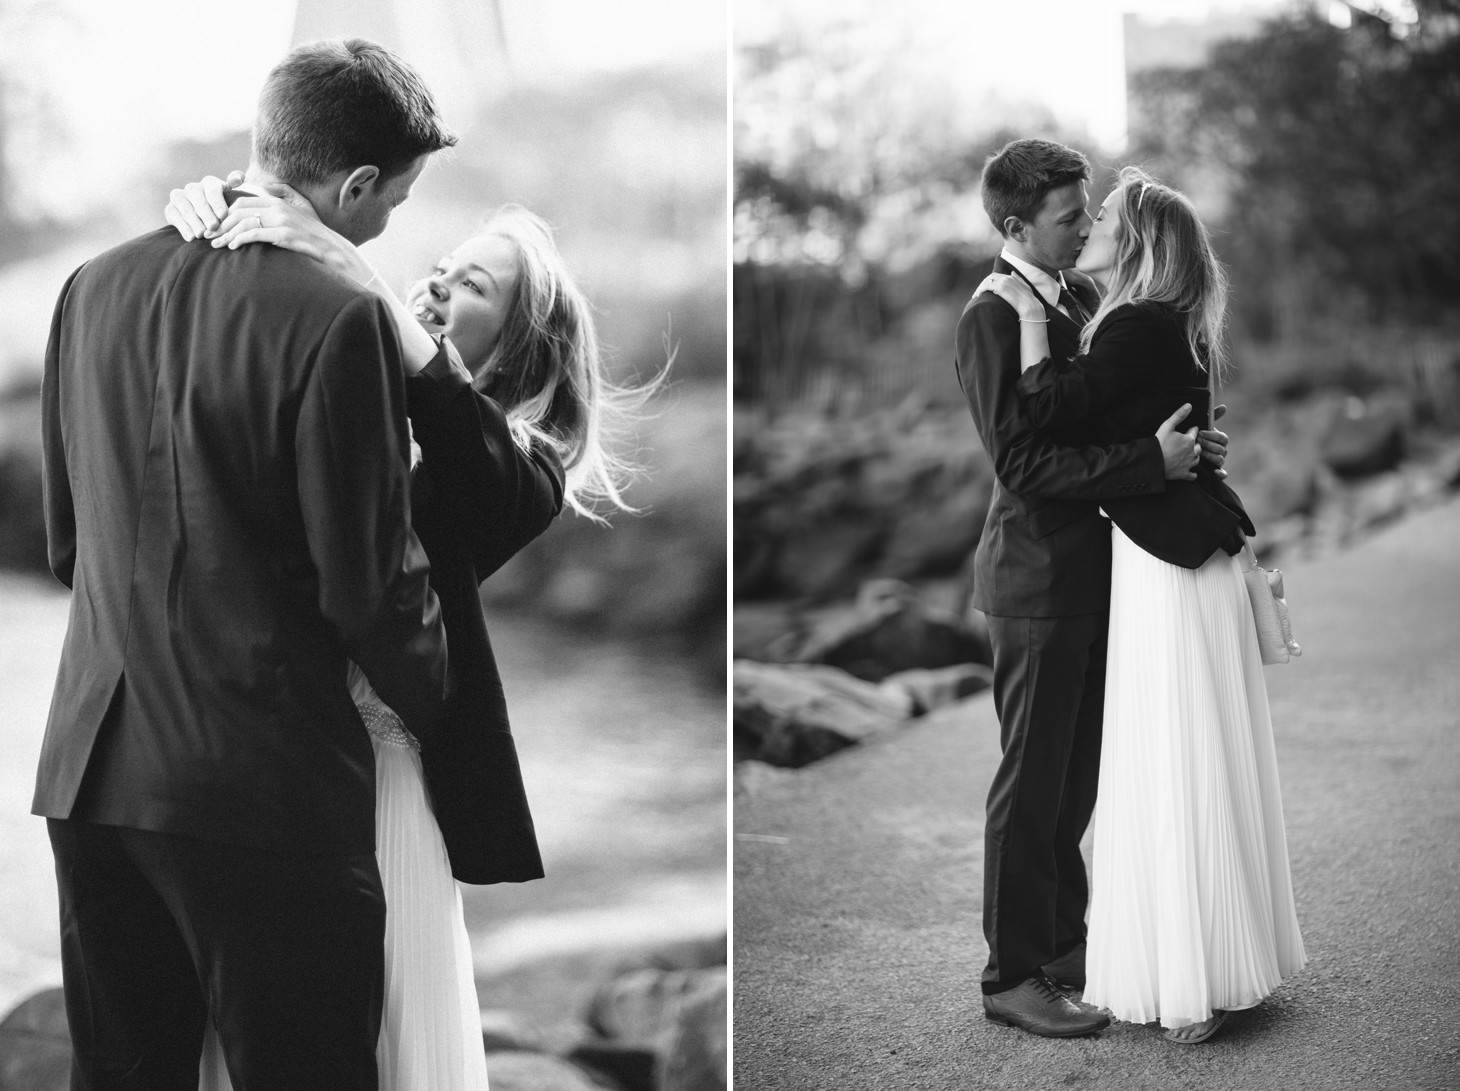 nyc-wedding-photographer-brooklyn-bridge-smitten-chickens-photo005.jpg